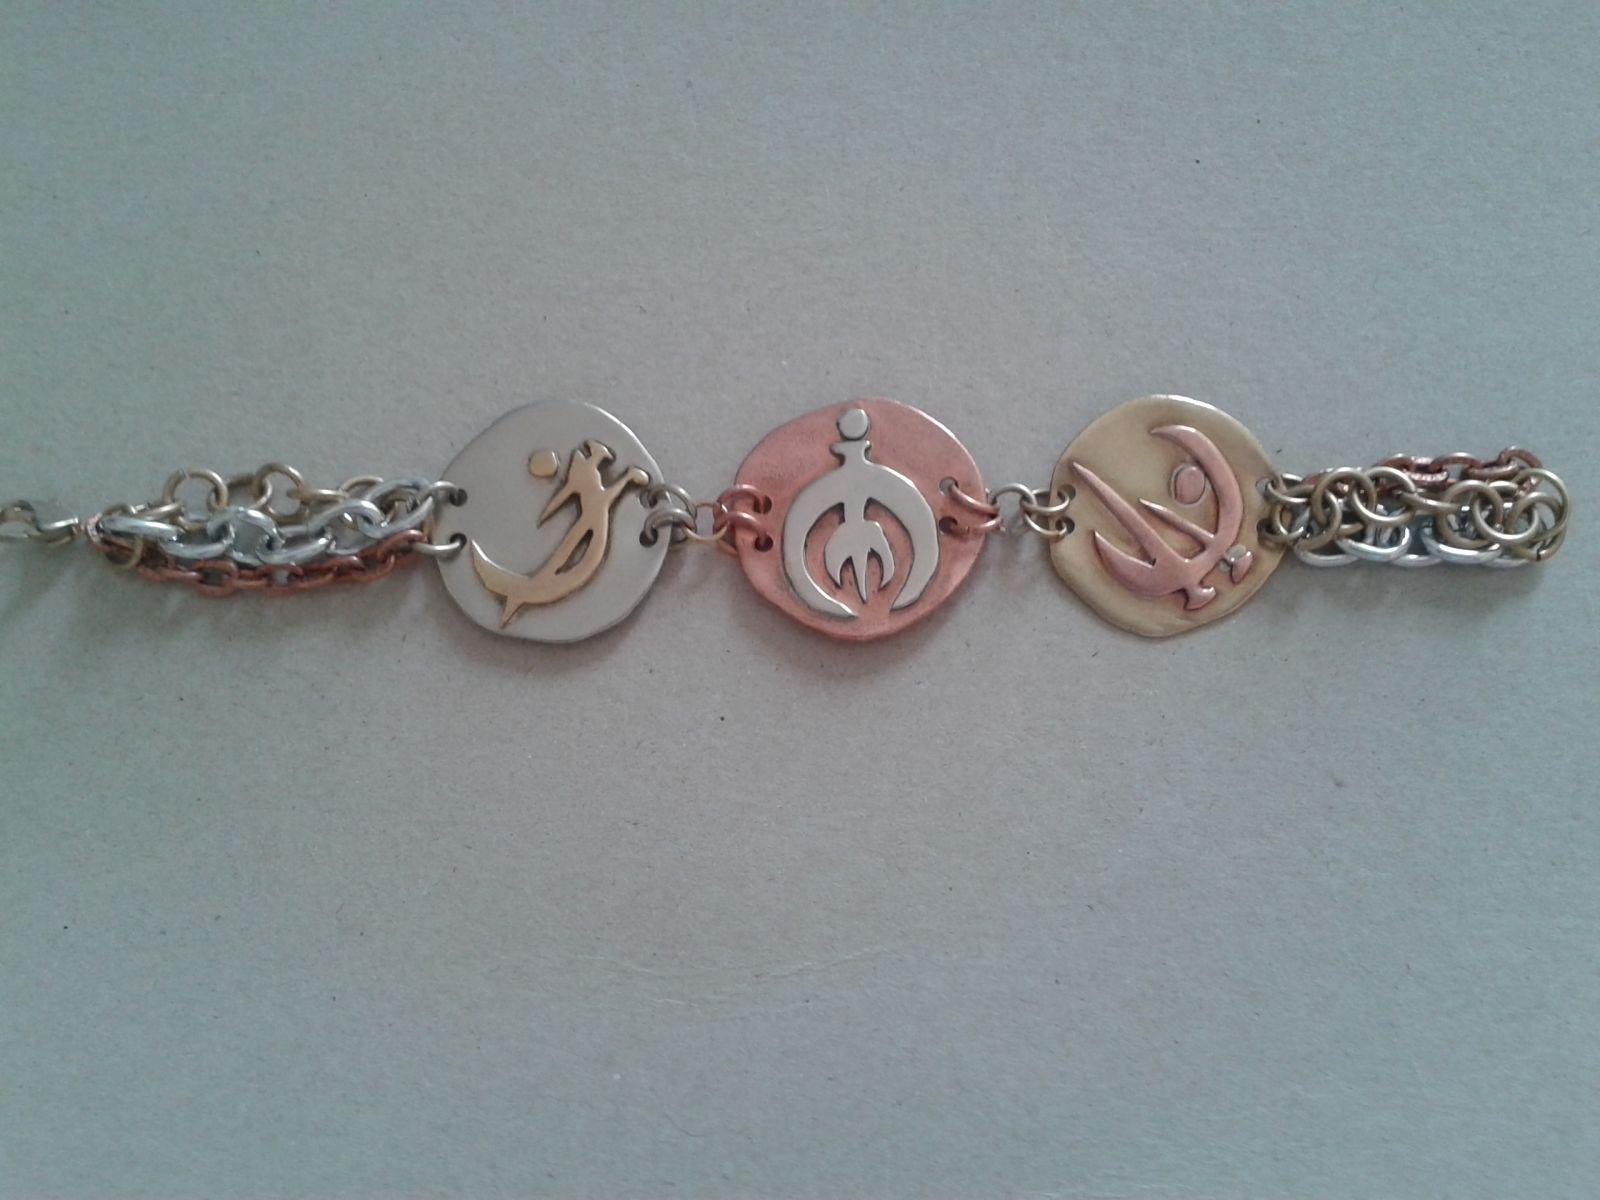 mistborn bracelet By dawnflower8 d8mcr74